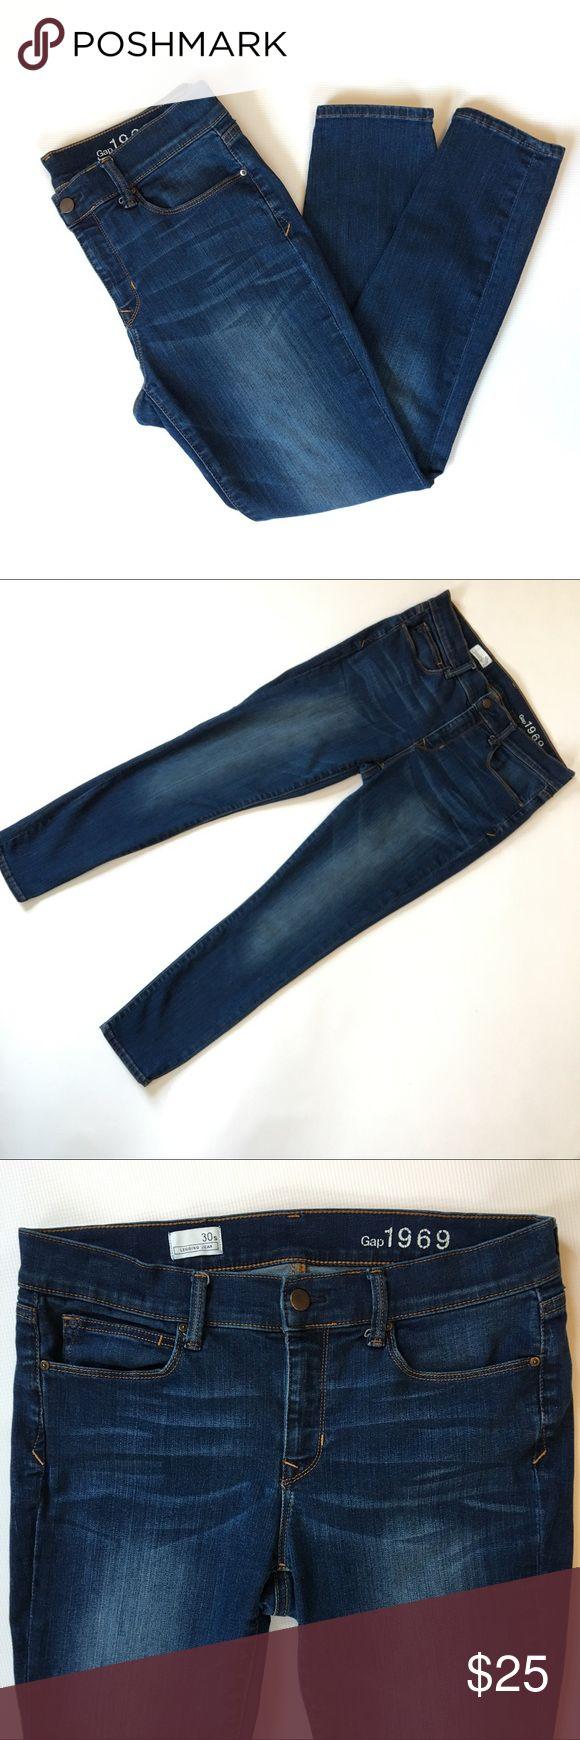 "Gap Legging Jean Great pair of Gap legging jeans in Santa Cruz Blue. Nice stretch. Excellent pre-loved condition.  Pet free/Smoke free.   Measurements laying flat: •Waist 16.5"" •Inseam 27"" •Rise 9.5"" •Leg opening 5.5"" GAP Jeans Skinny"